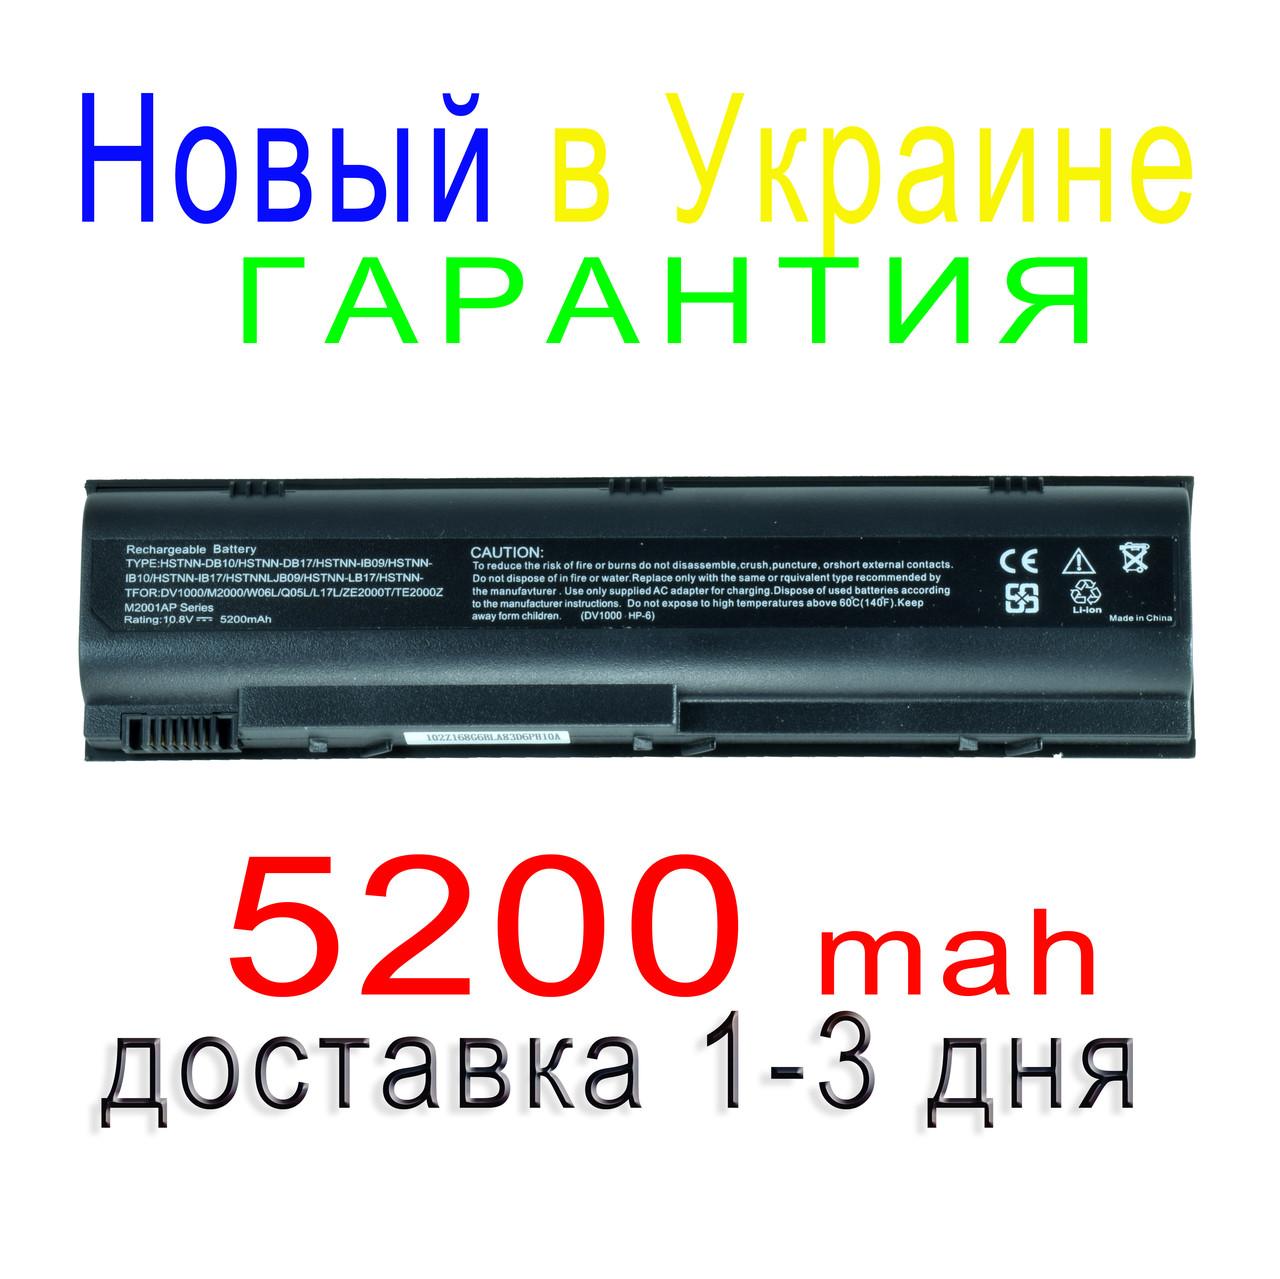 Аккумулятор батарея HP  G5009EA G5040EA G5042EA G5050EA G5050EI G5050EO G5050ET G5050EW G5051EA